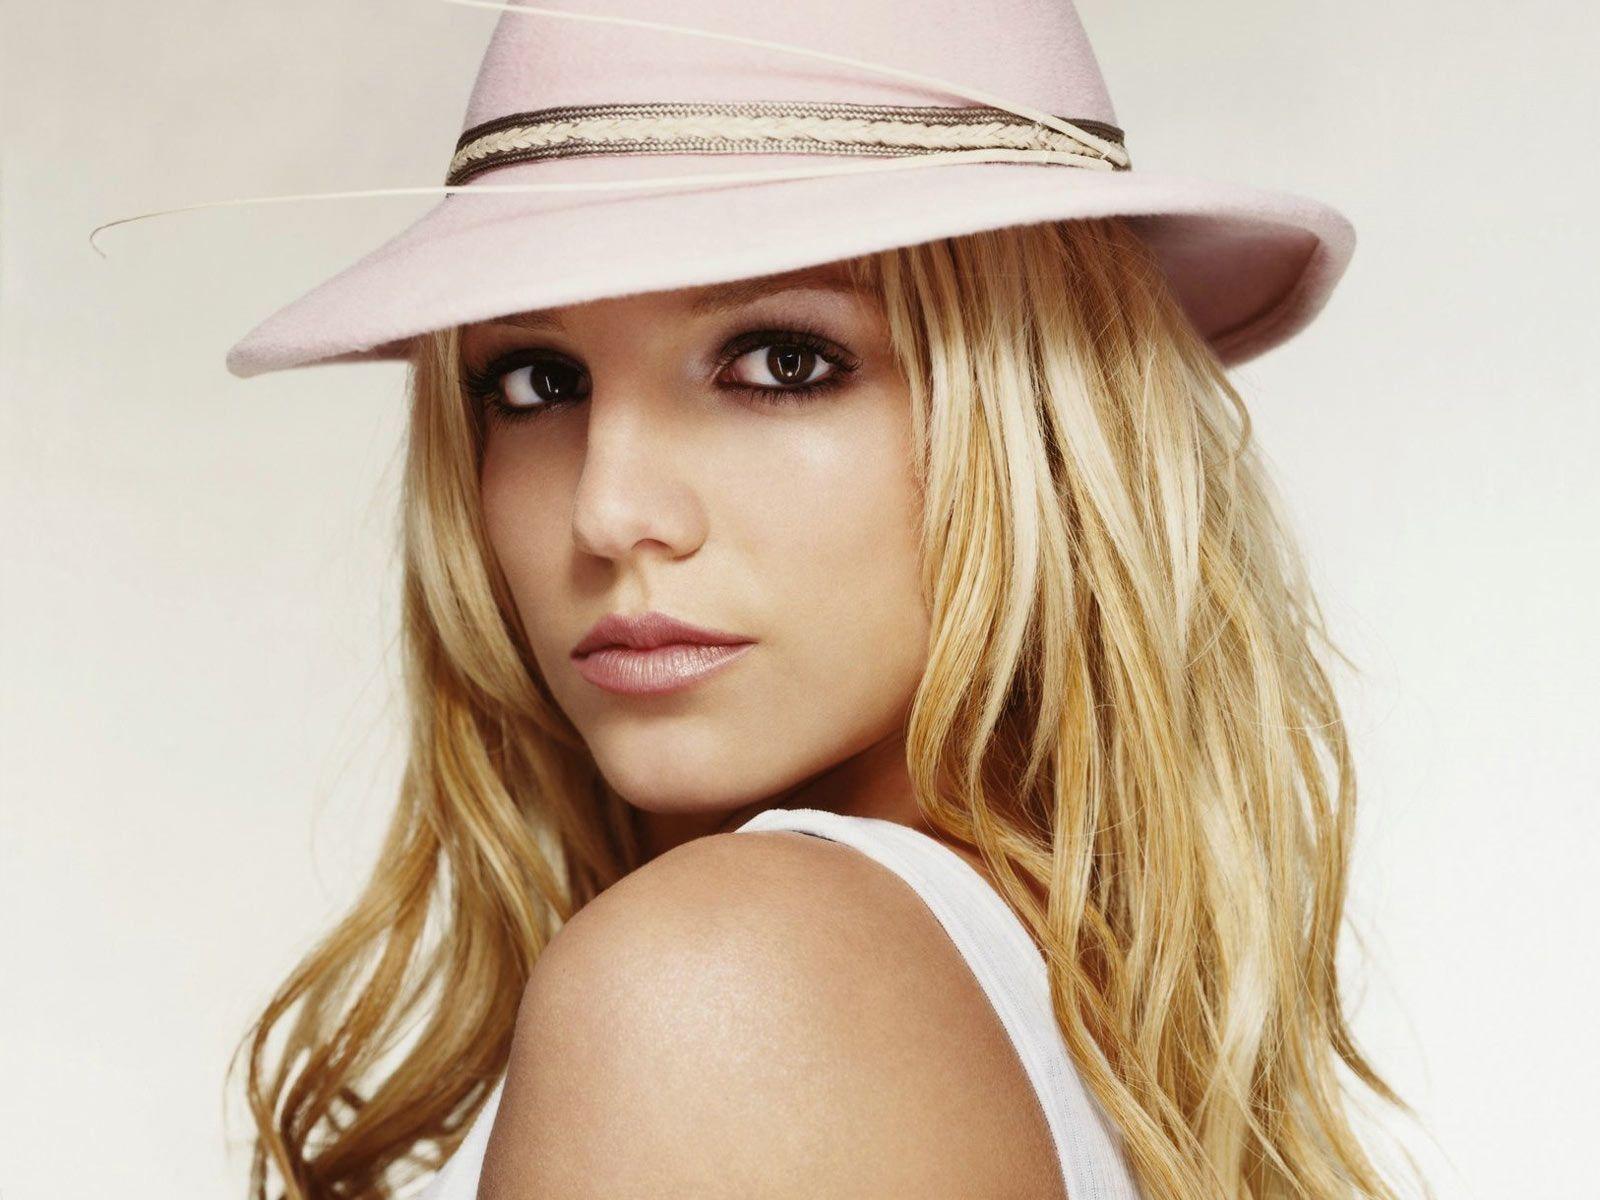 http://2.bp.blogspot.com/-Df6iCzr44h8/UQJSsAf77rI/AAAAAAAADX4/SeY7ZP10mgk/s1600/Britney-Spears-9.jpg